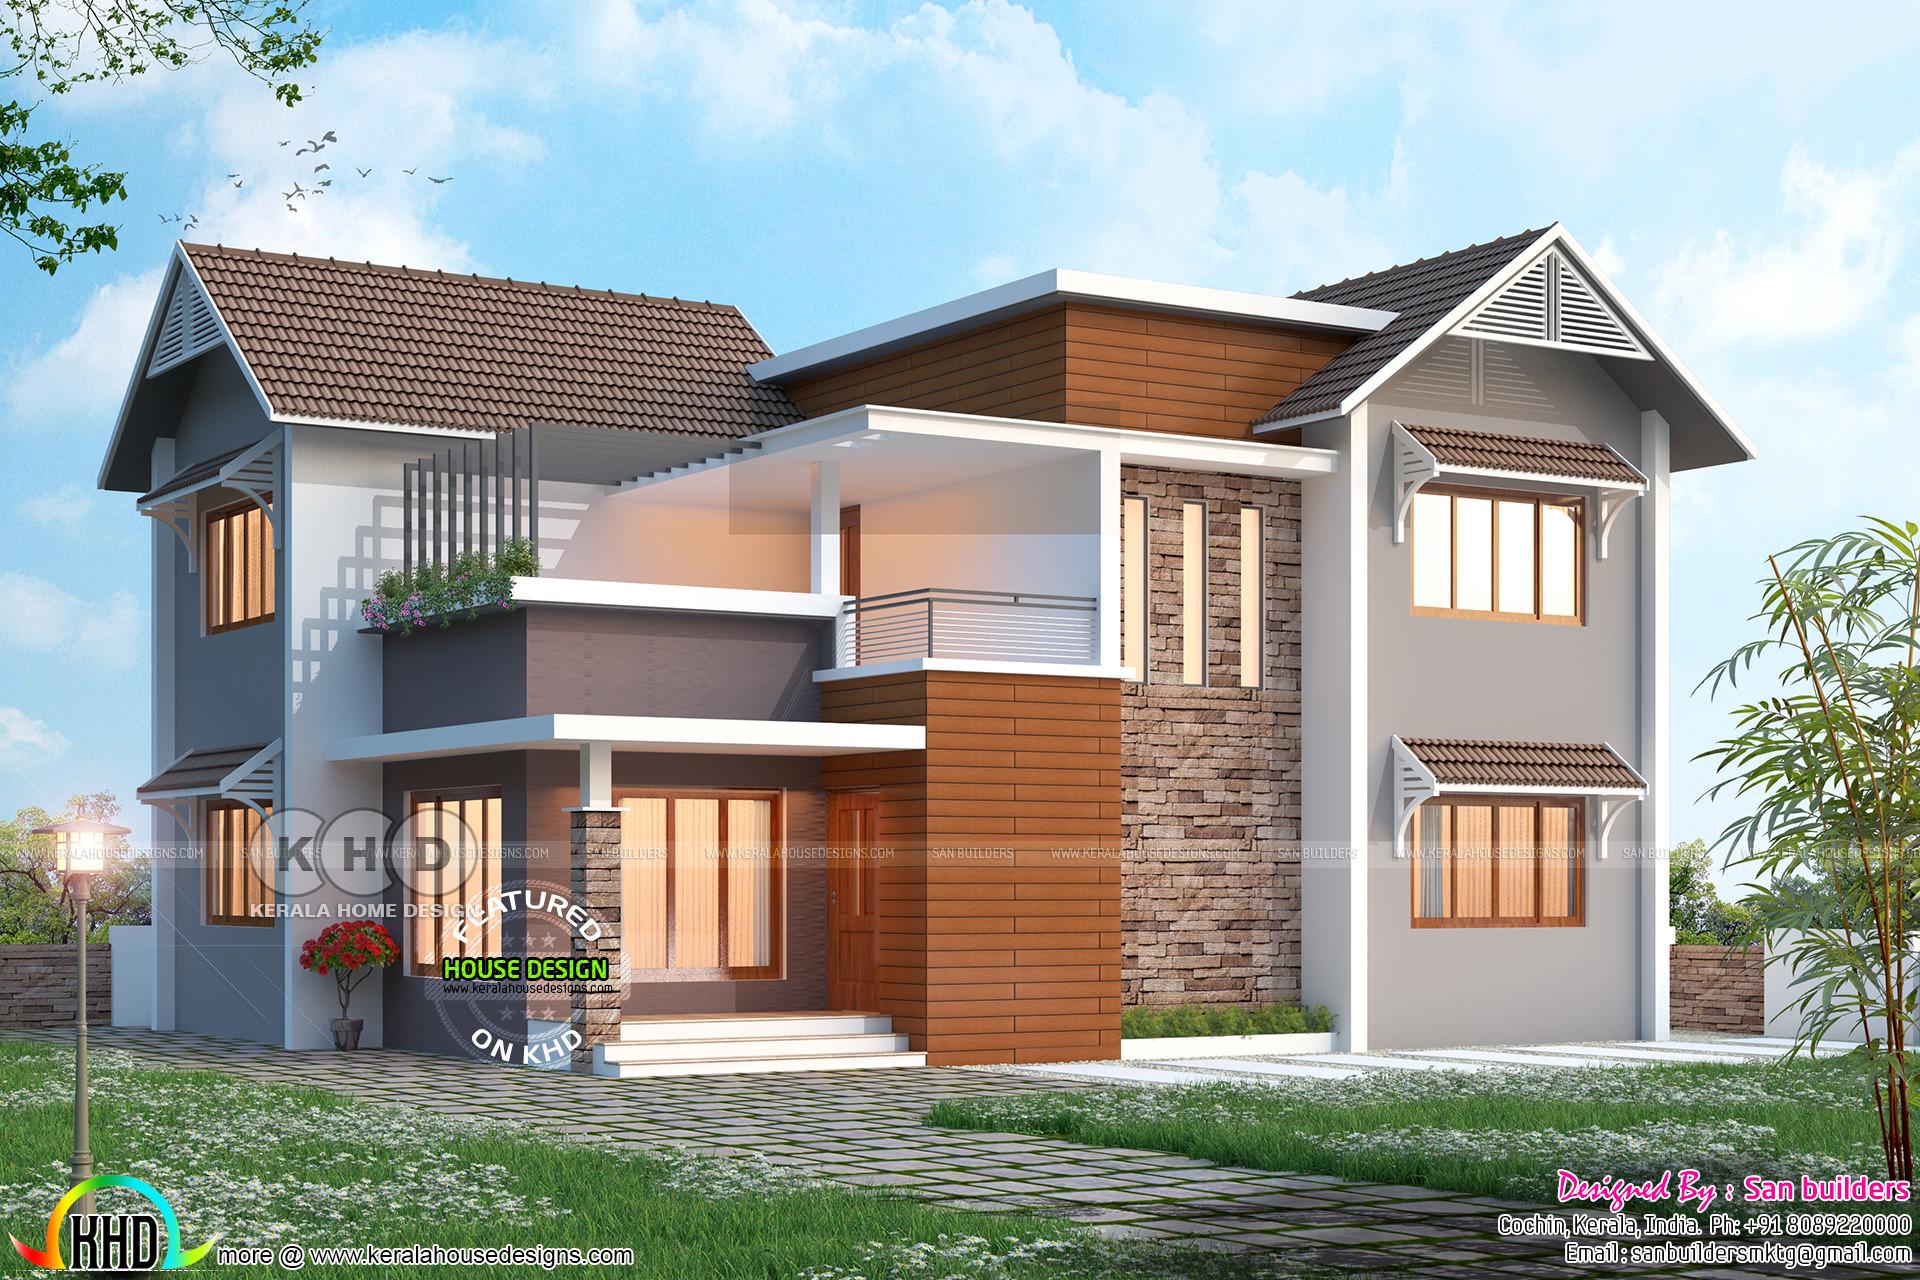 march 2018 house design modern house kerala home